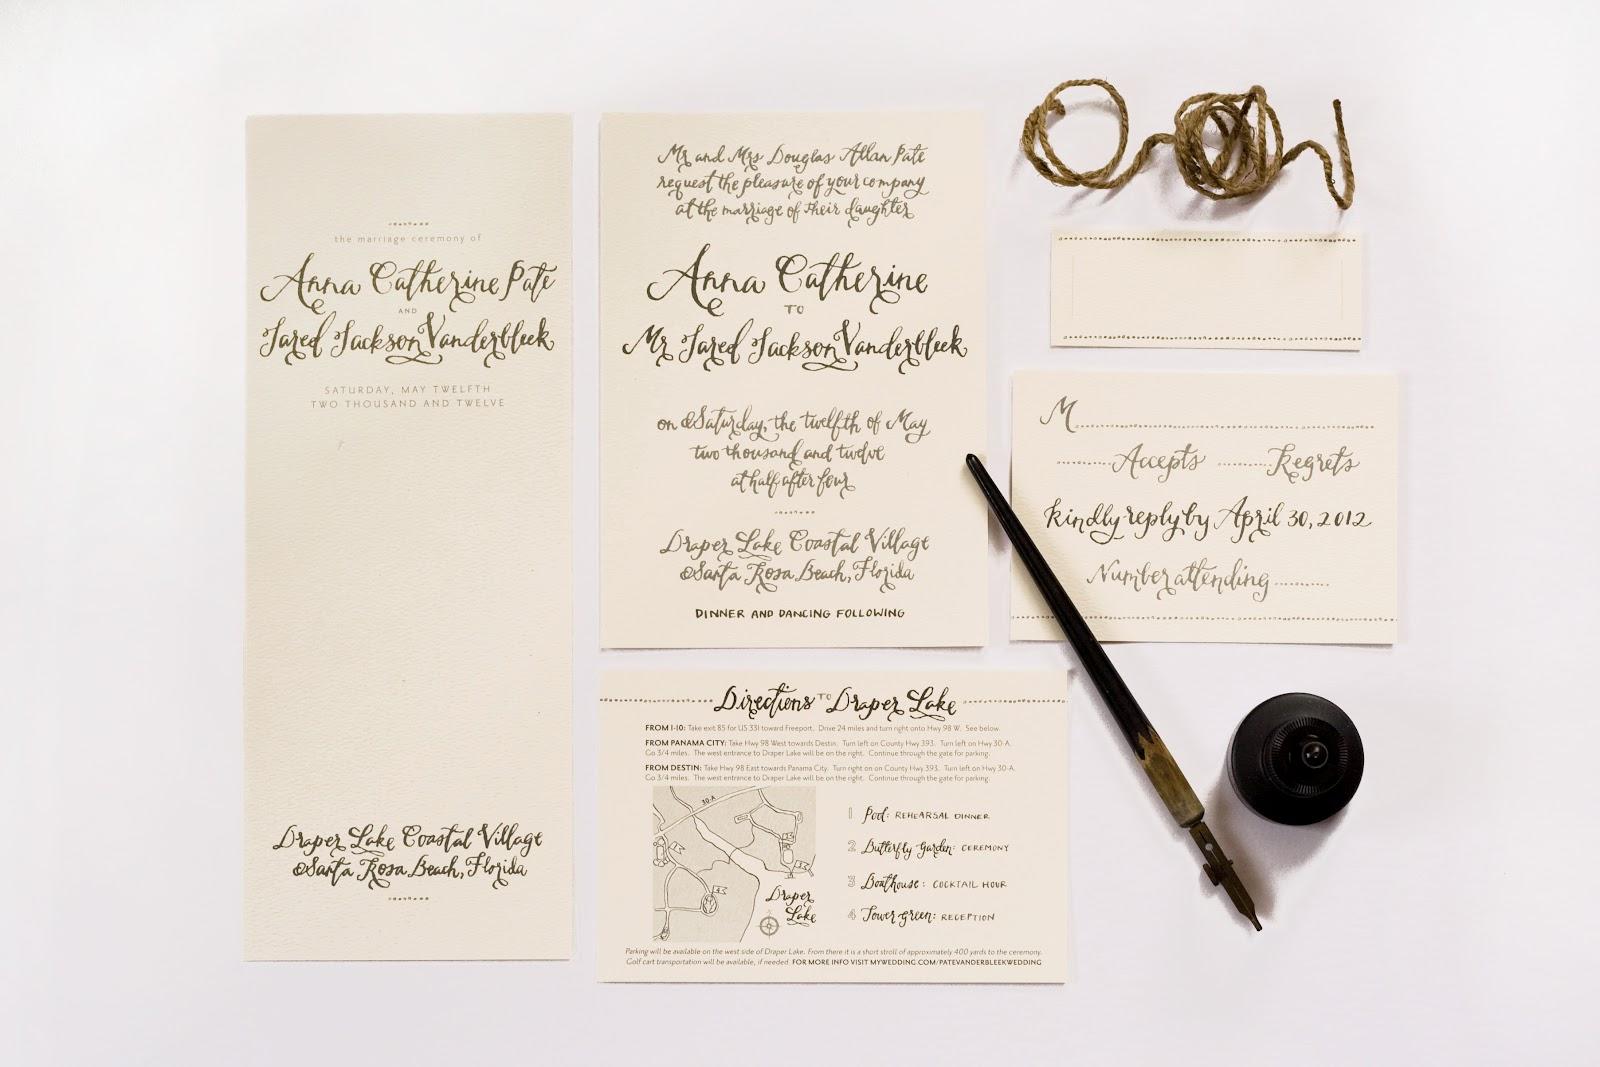 How Do You Stuff A Wedding Invitation: The Good Stuff: WEDDING INVITATION SUITE: Anna Pate